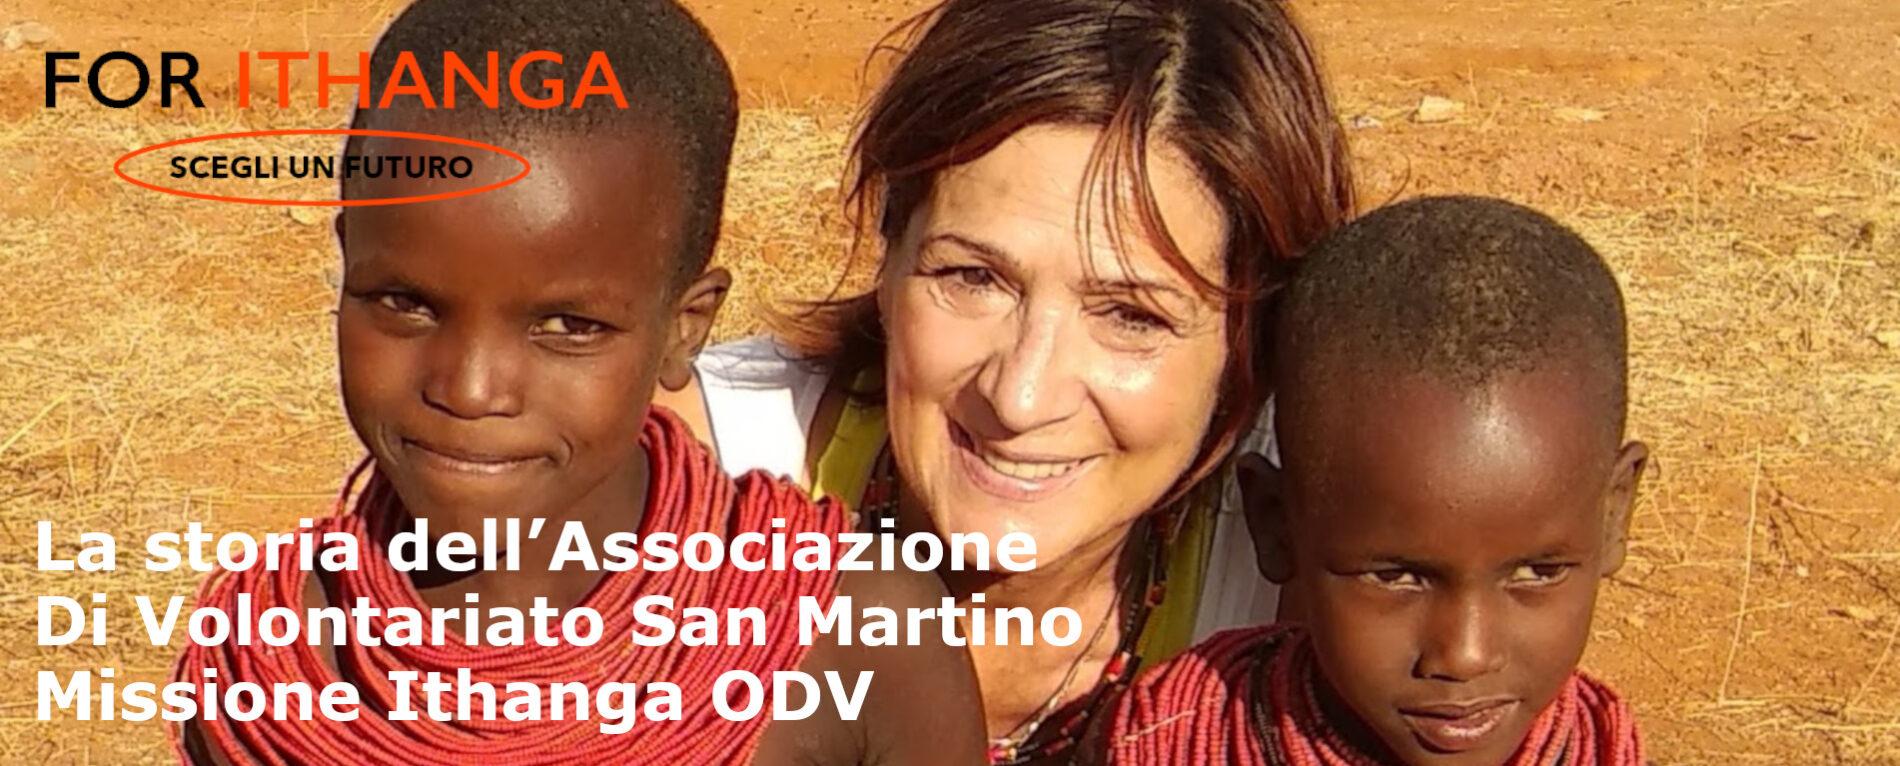 missione in Africa